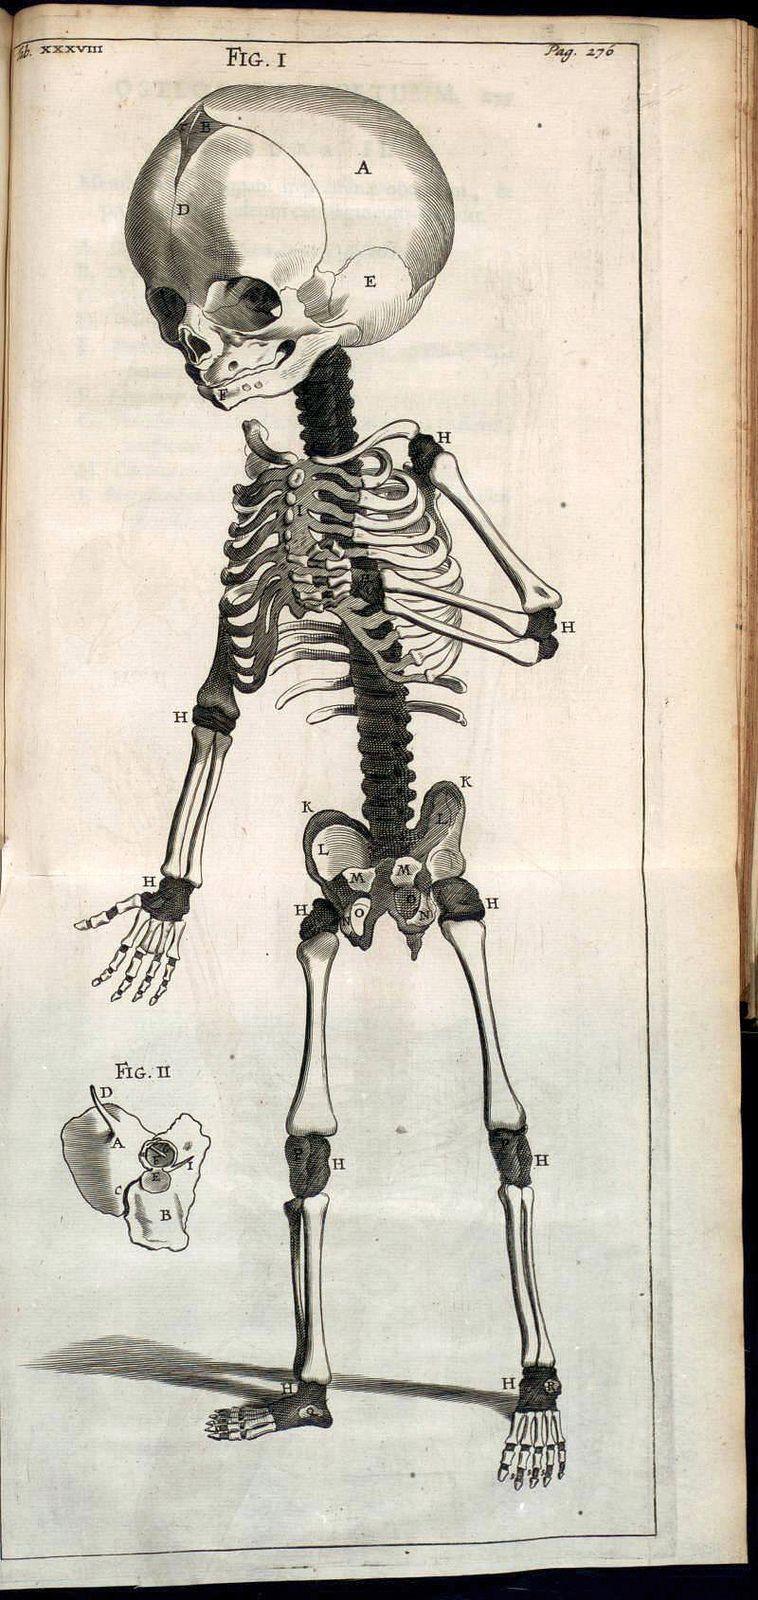 Anatomy Illustrations 1600s | XVIIth Anatomy | Pinterest